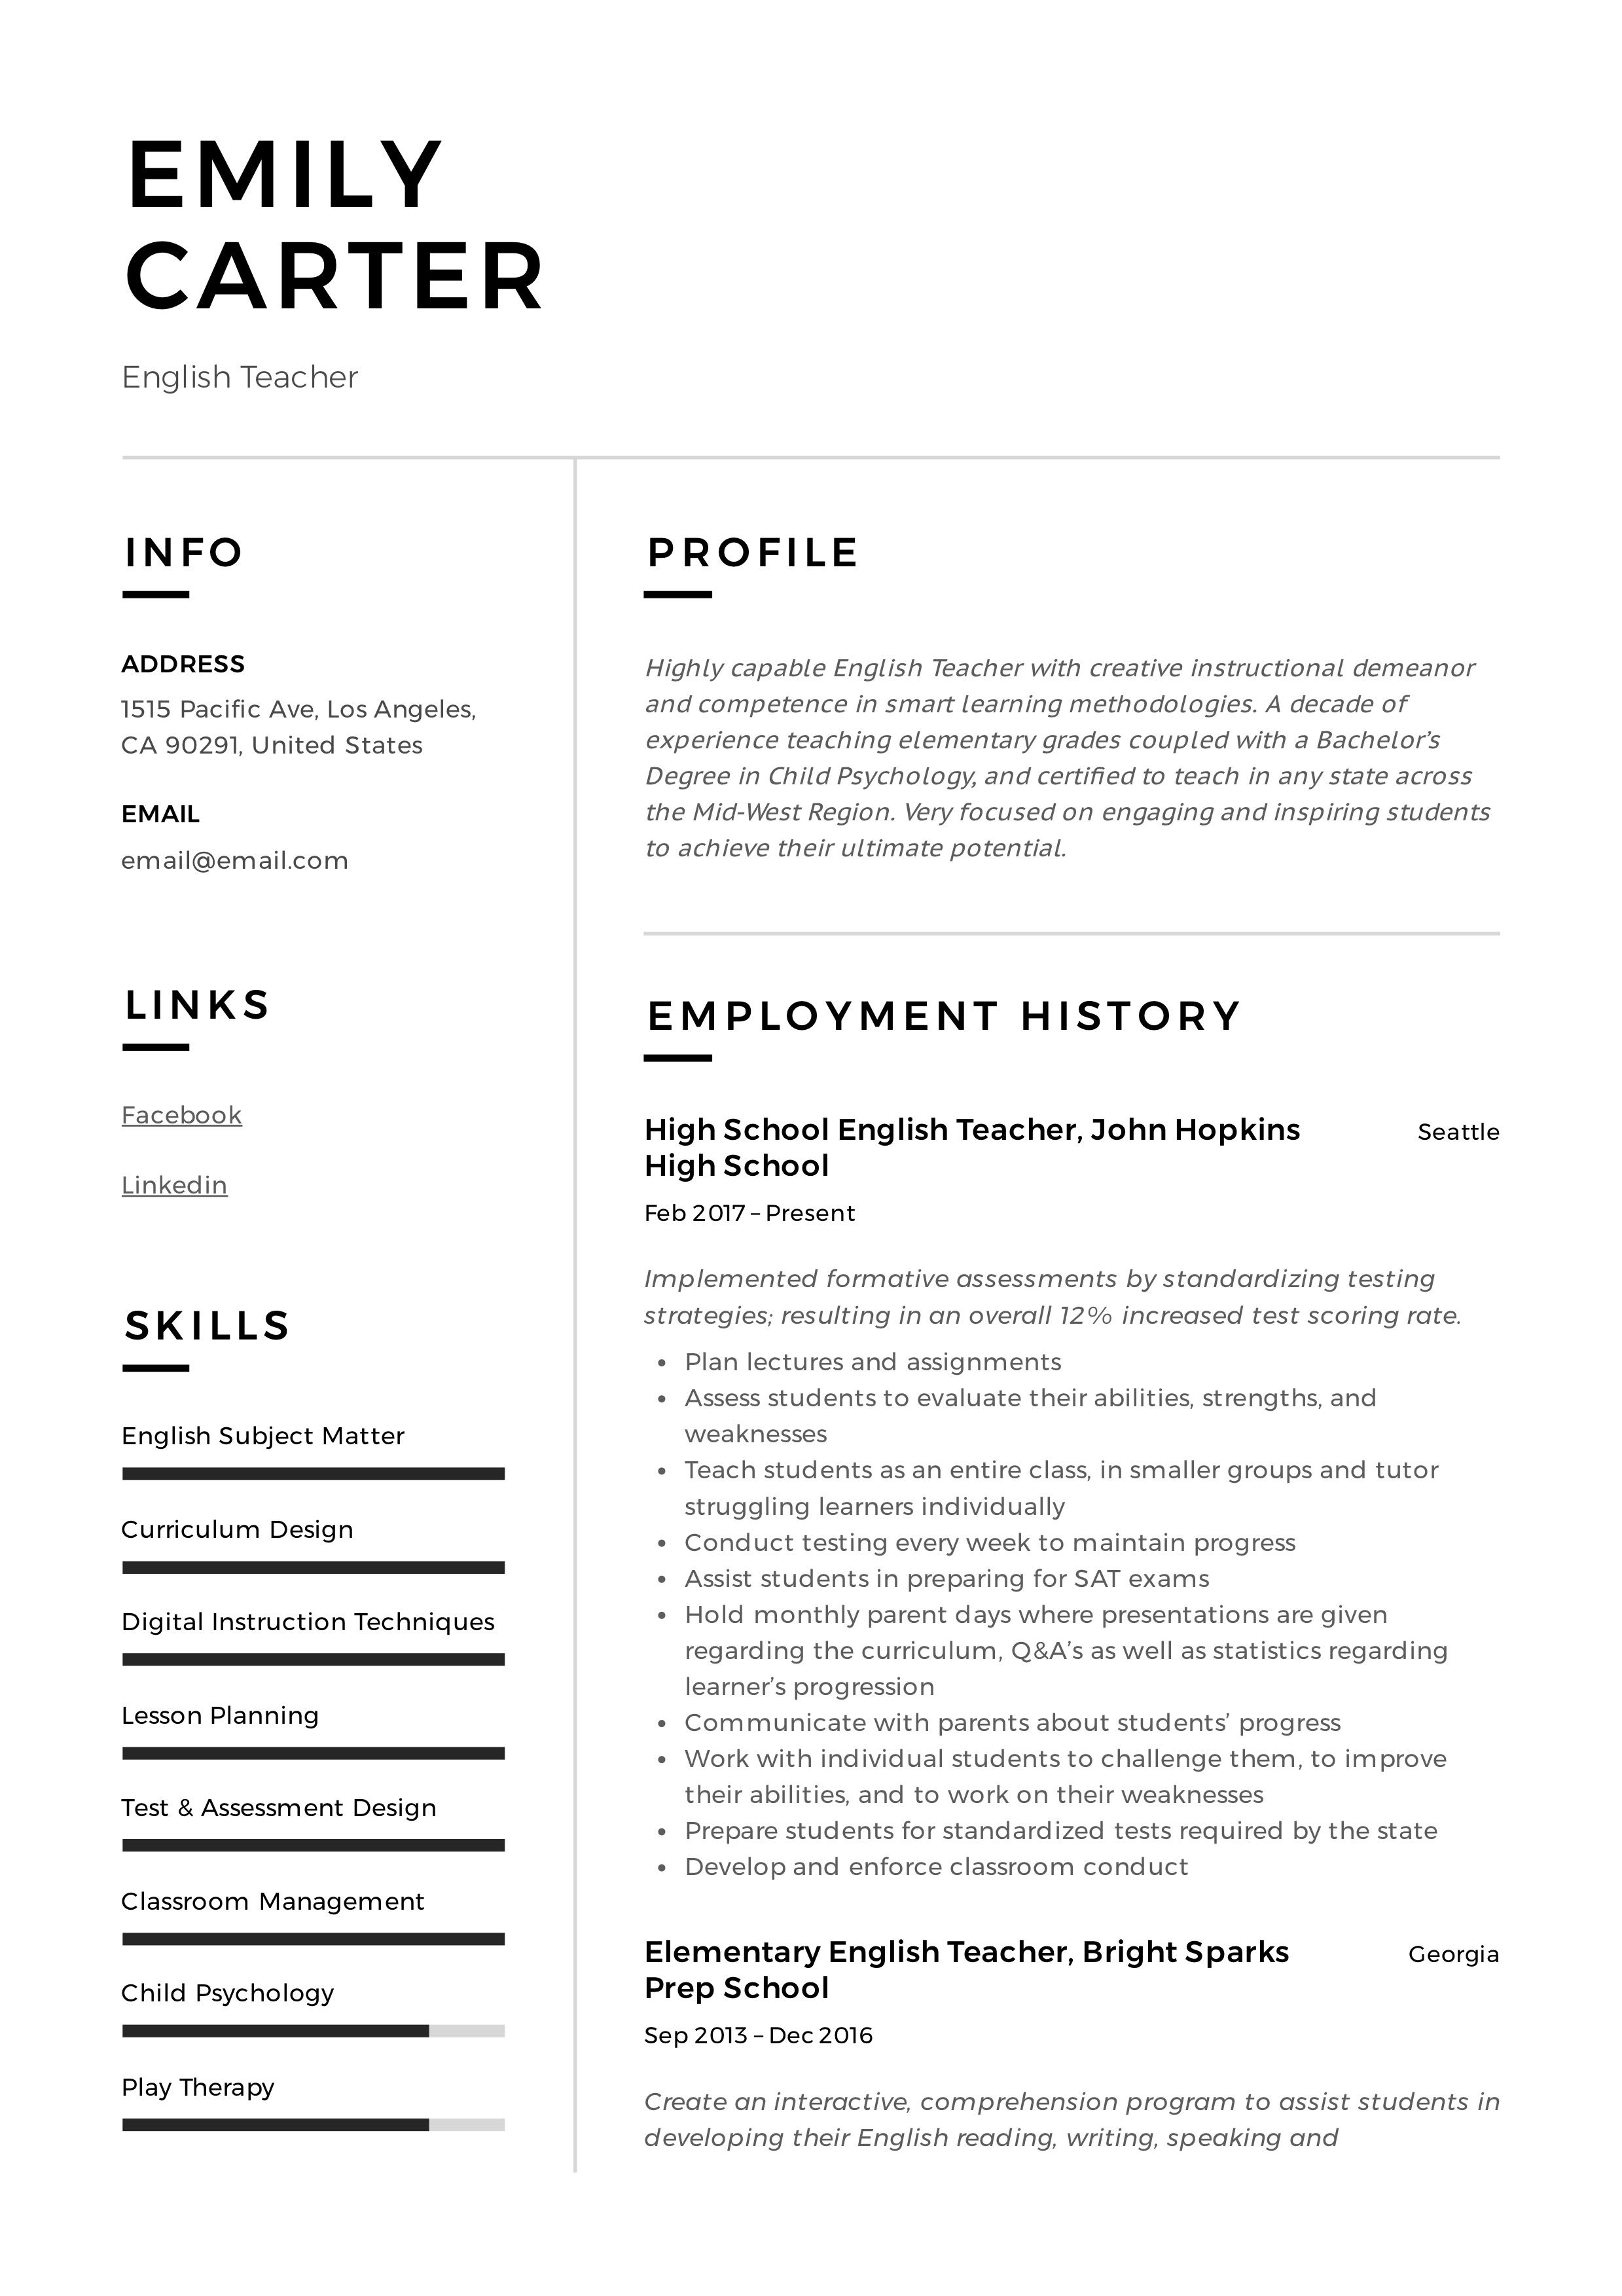 professional english school teacher resume template